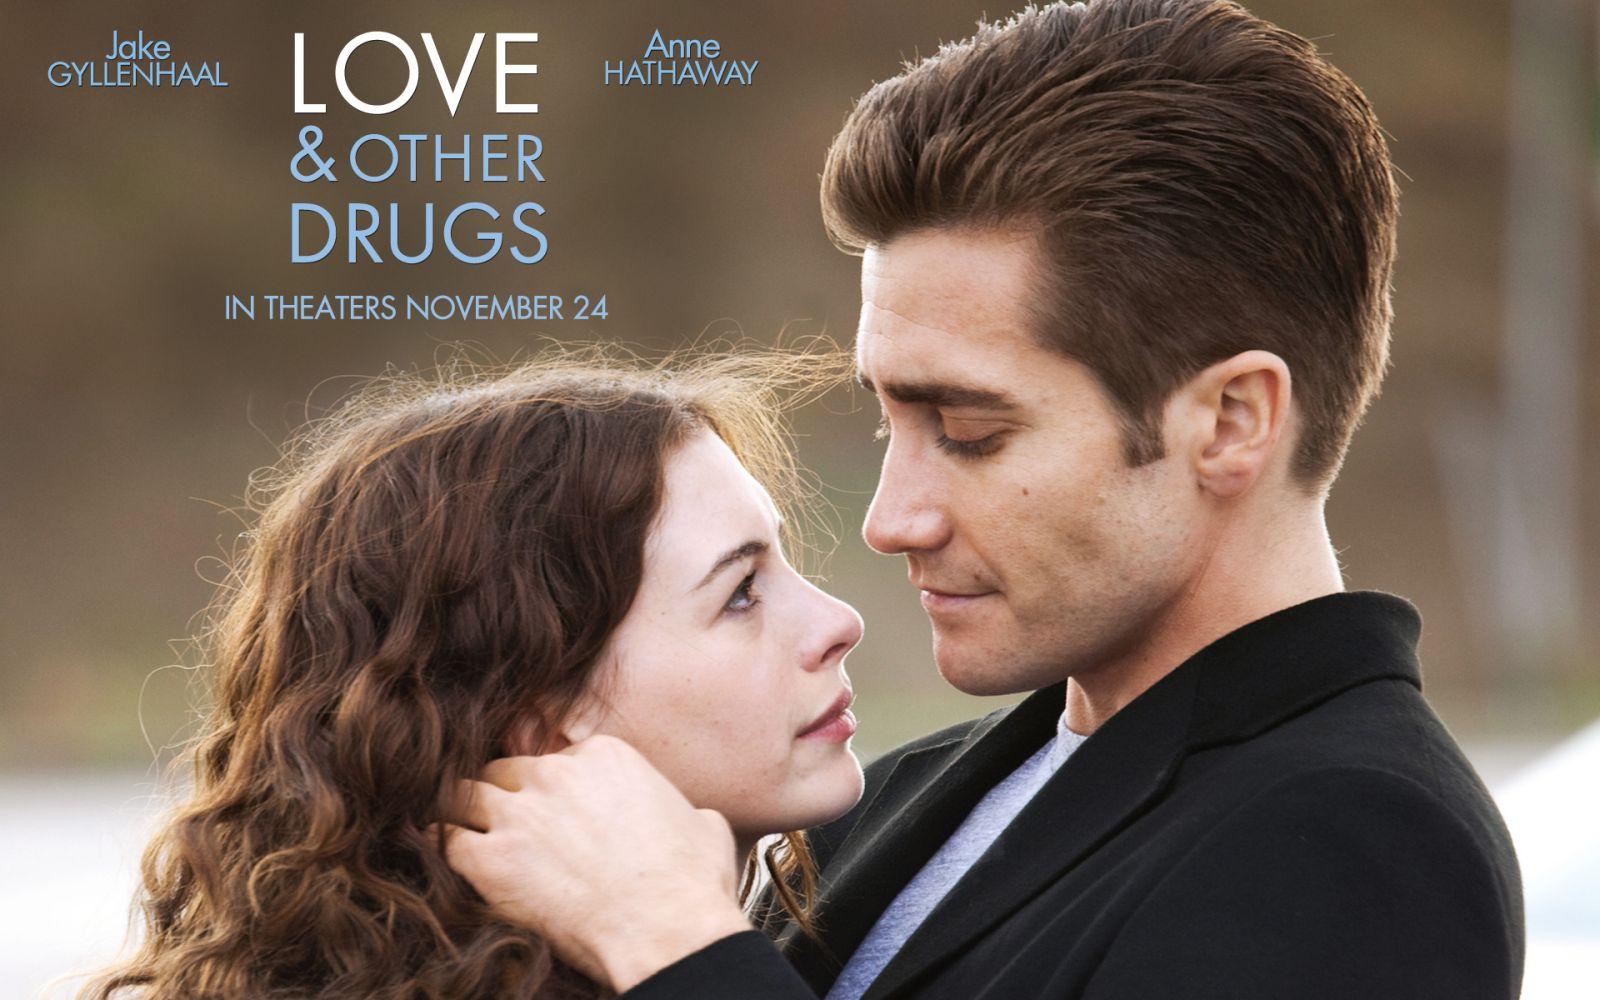 http://2.bp.blogspot.com/_CXiEfIjzFOI/TRtVS2PDpqI/AAAAAAAAEmw/ygDn68M7VSg/s1600/love_and_other_drugs_wallpaper_03.jpg